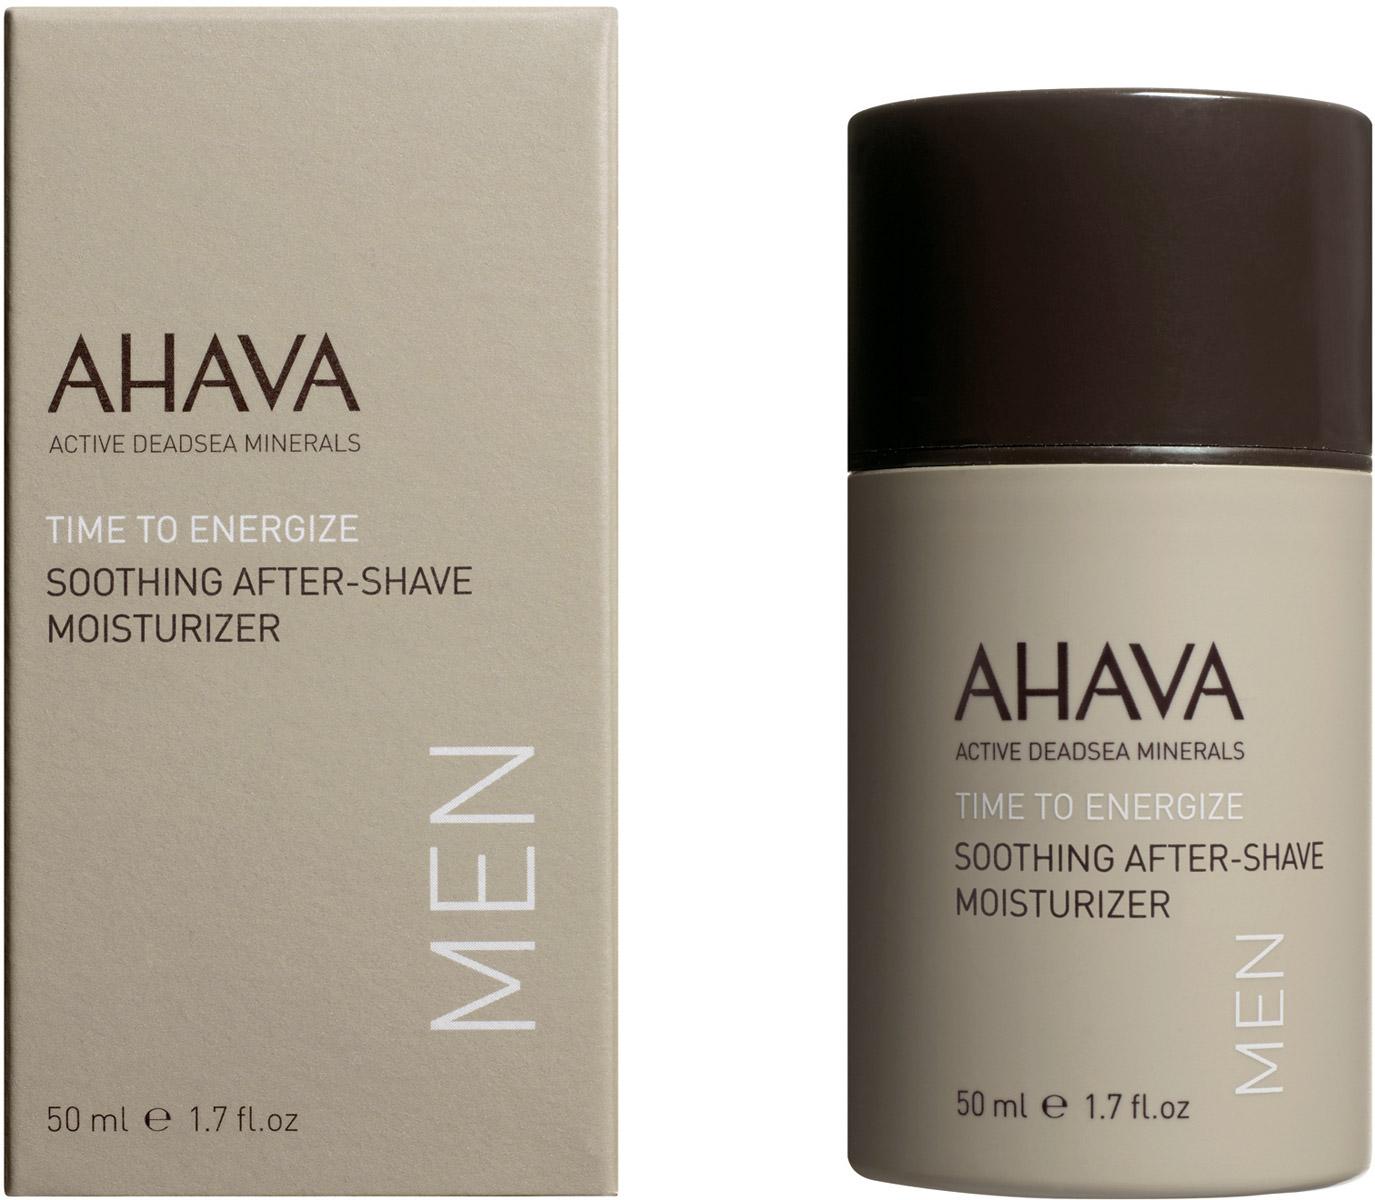 Ahava Time To Energize Успокаивающий увлажняющий крем после бритья 50 мл ahava time to revitalize радикально восстанавливающий ночной крем time to revitalize радикально восстанавливающий ночной крем